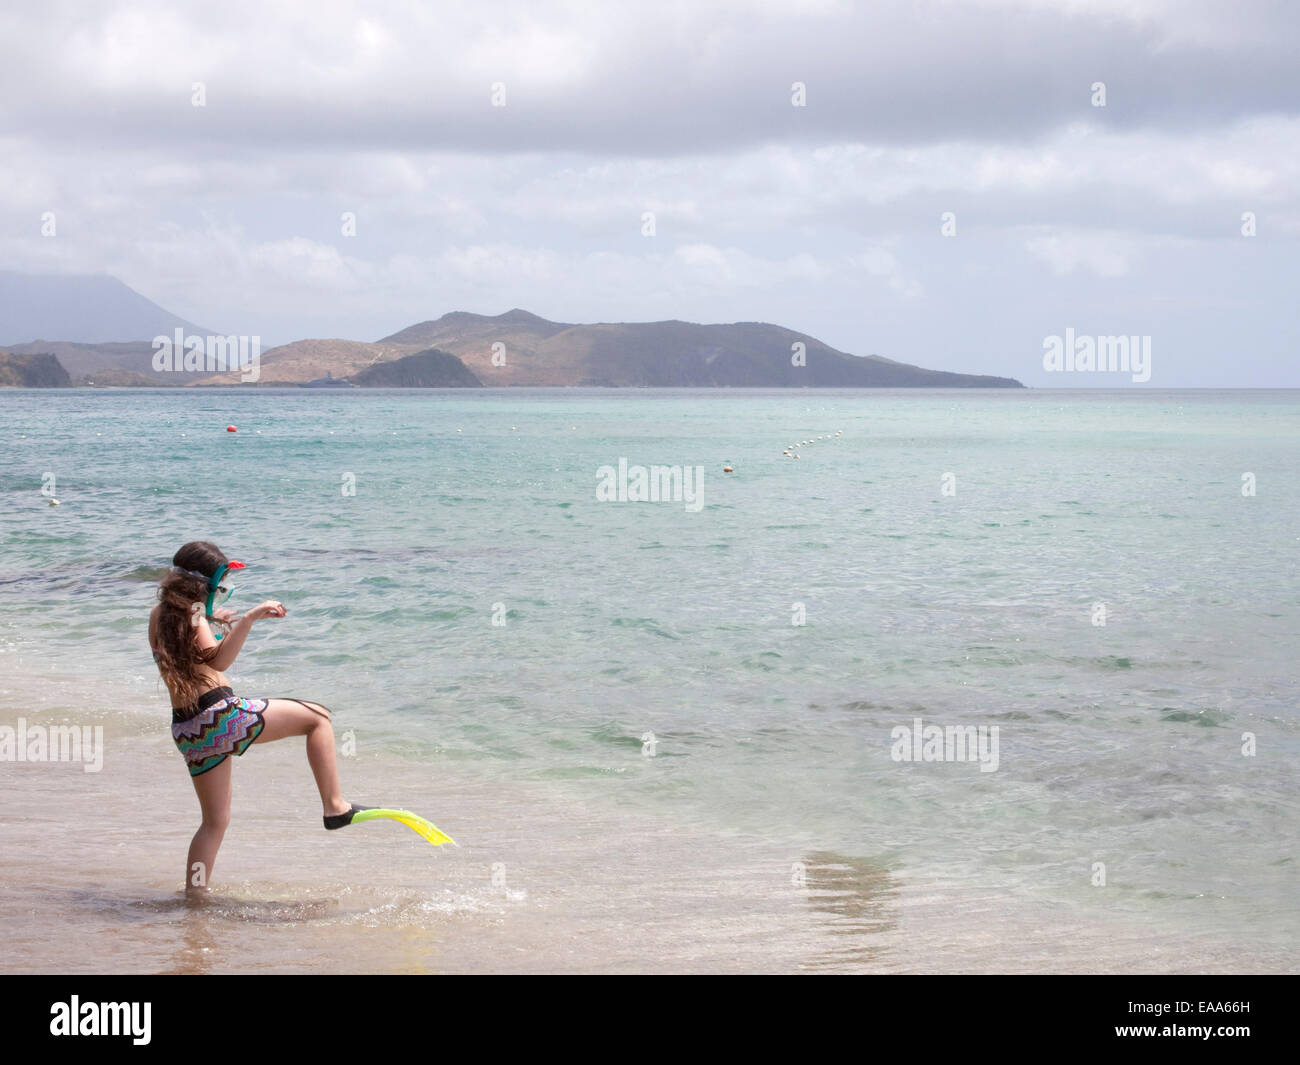 girl in snorkel gear walks towards sea - Stock Image